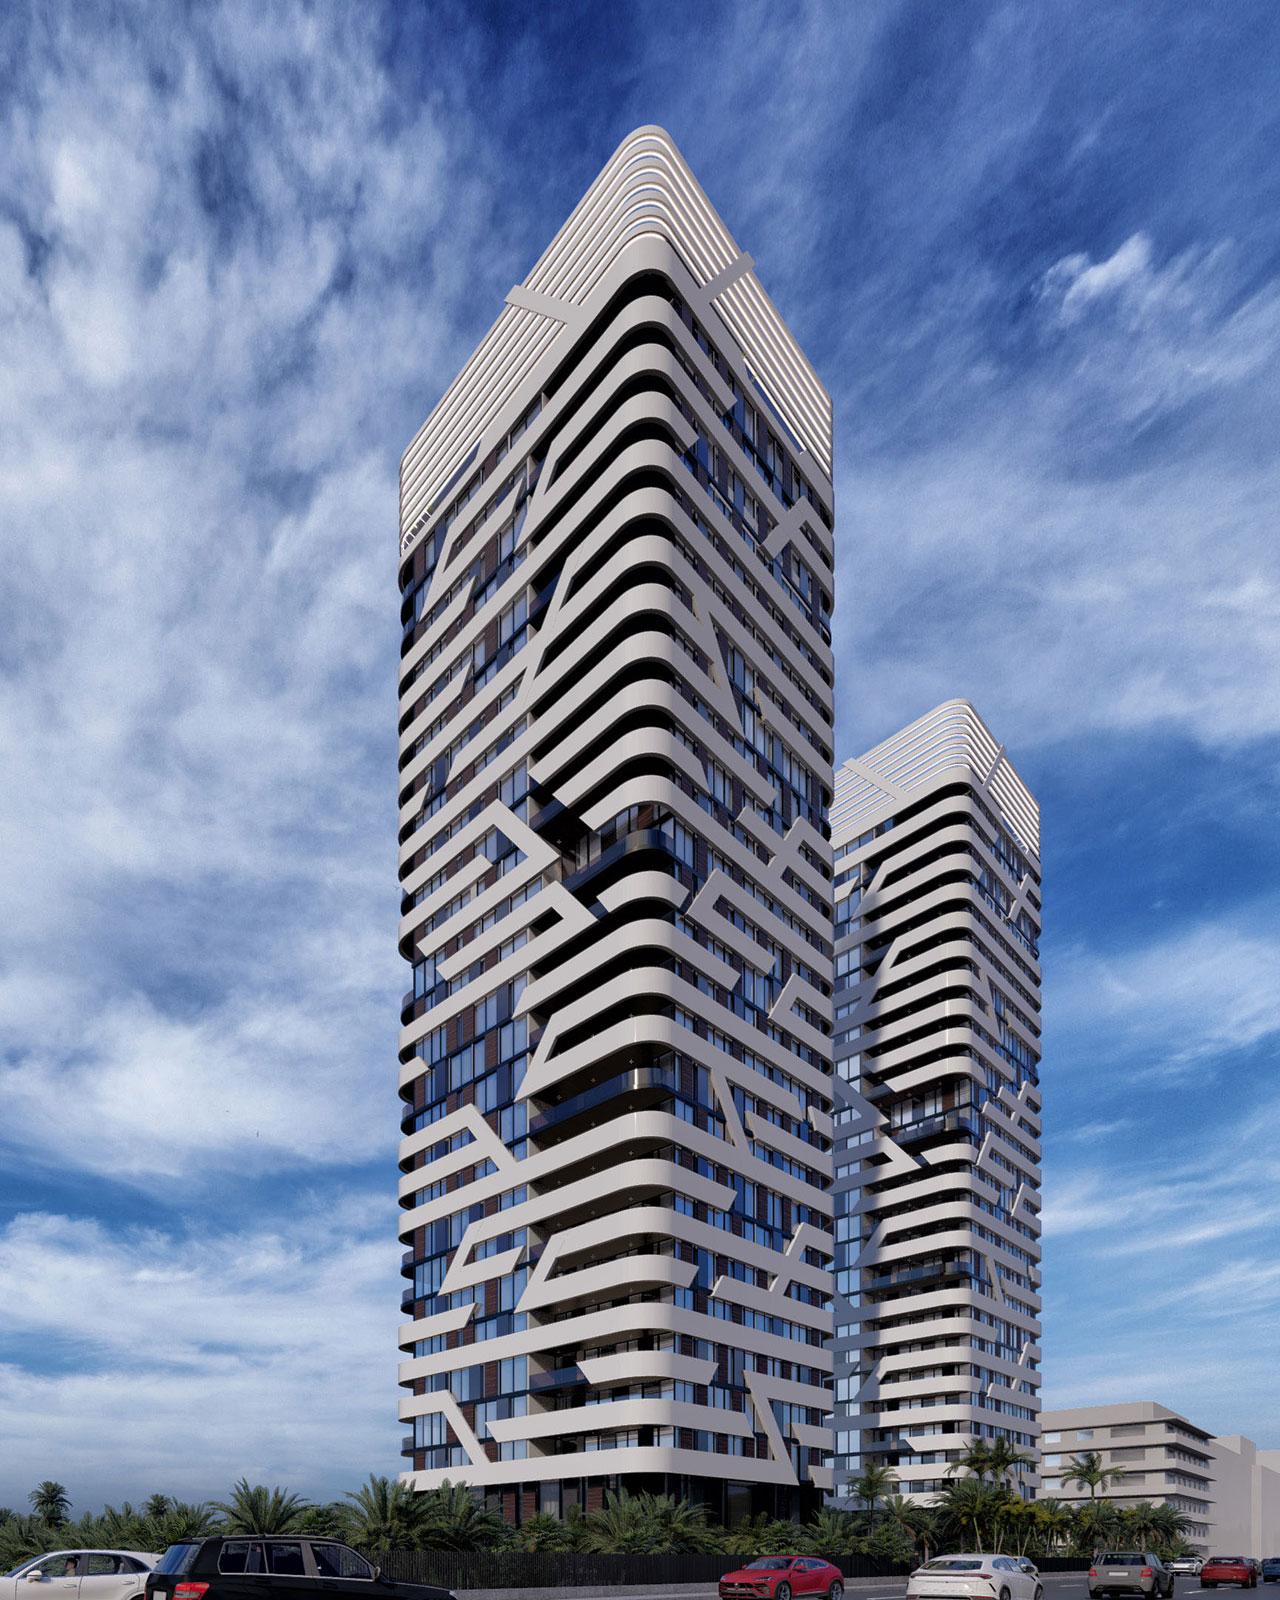 proyecto-torres-sinforosa-grupo-baraka(1280x1600)